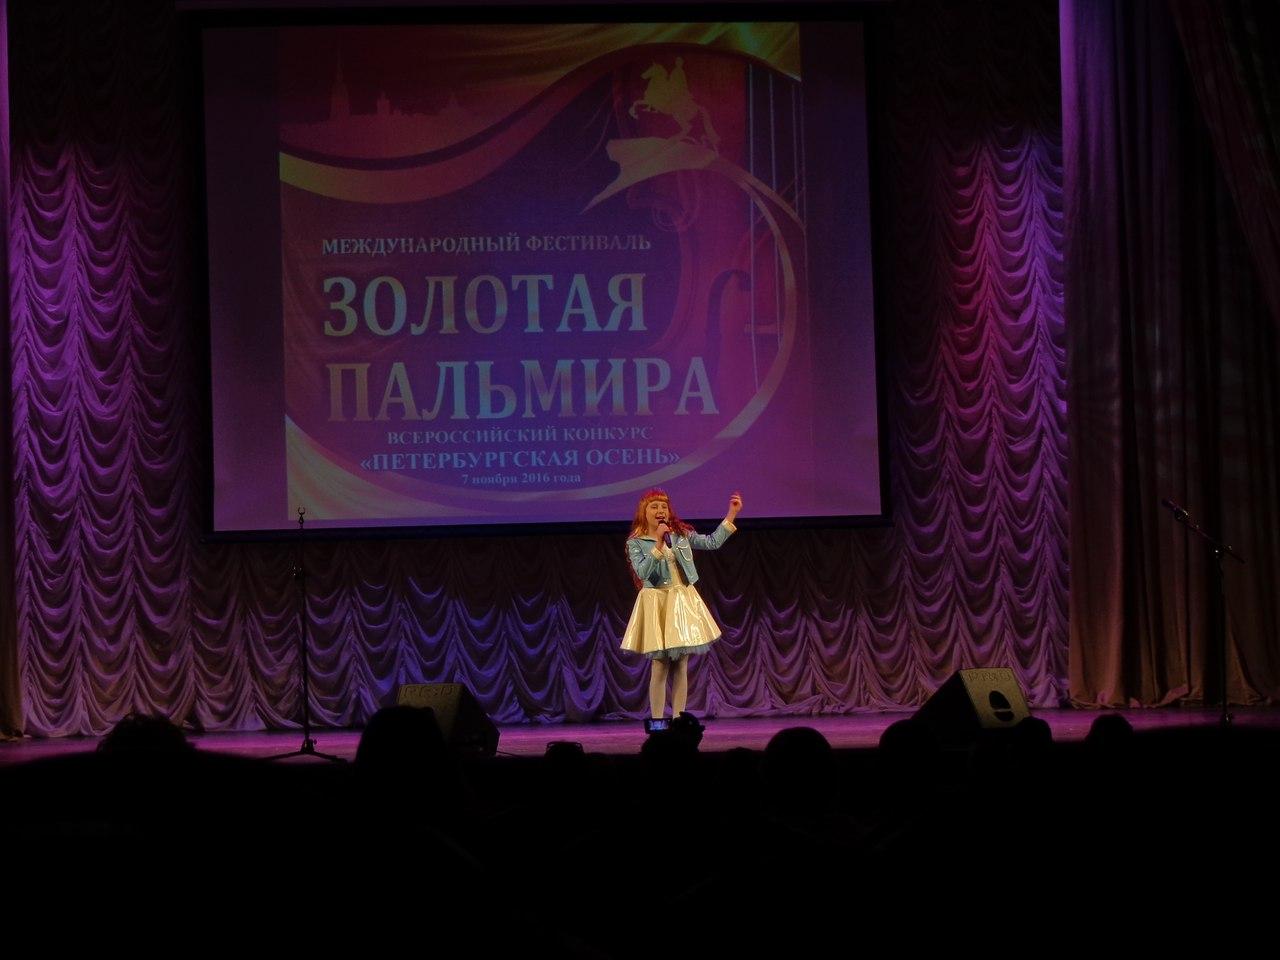 Петербургский конкурс